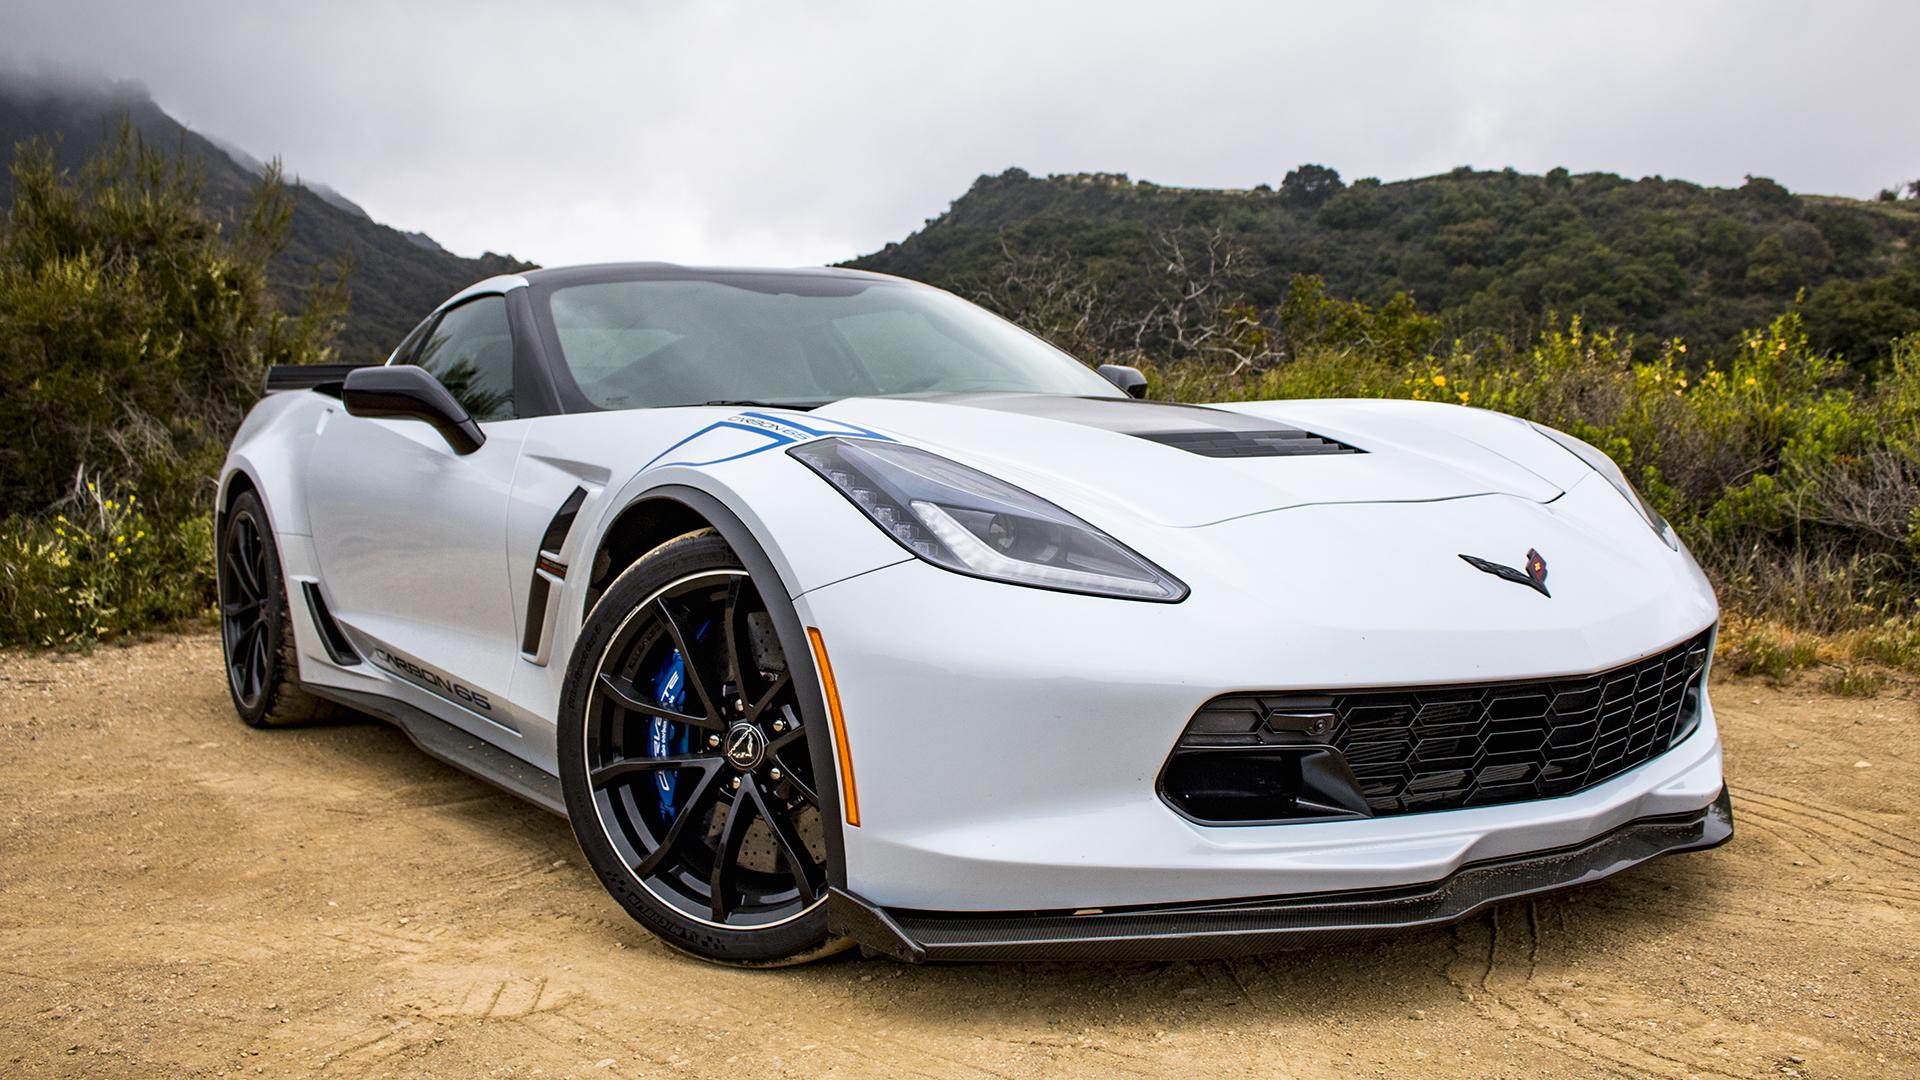 Kelebihan Kekurangan Corvette 65 Murah Berkualitas